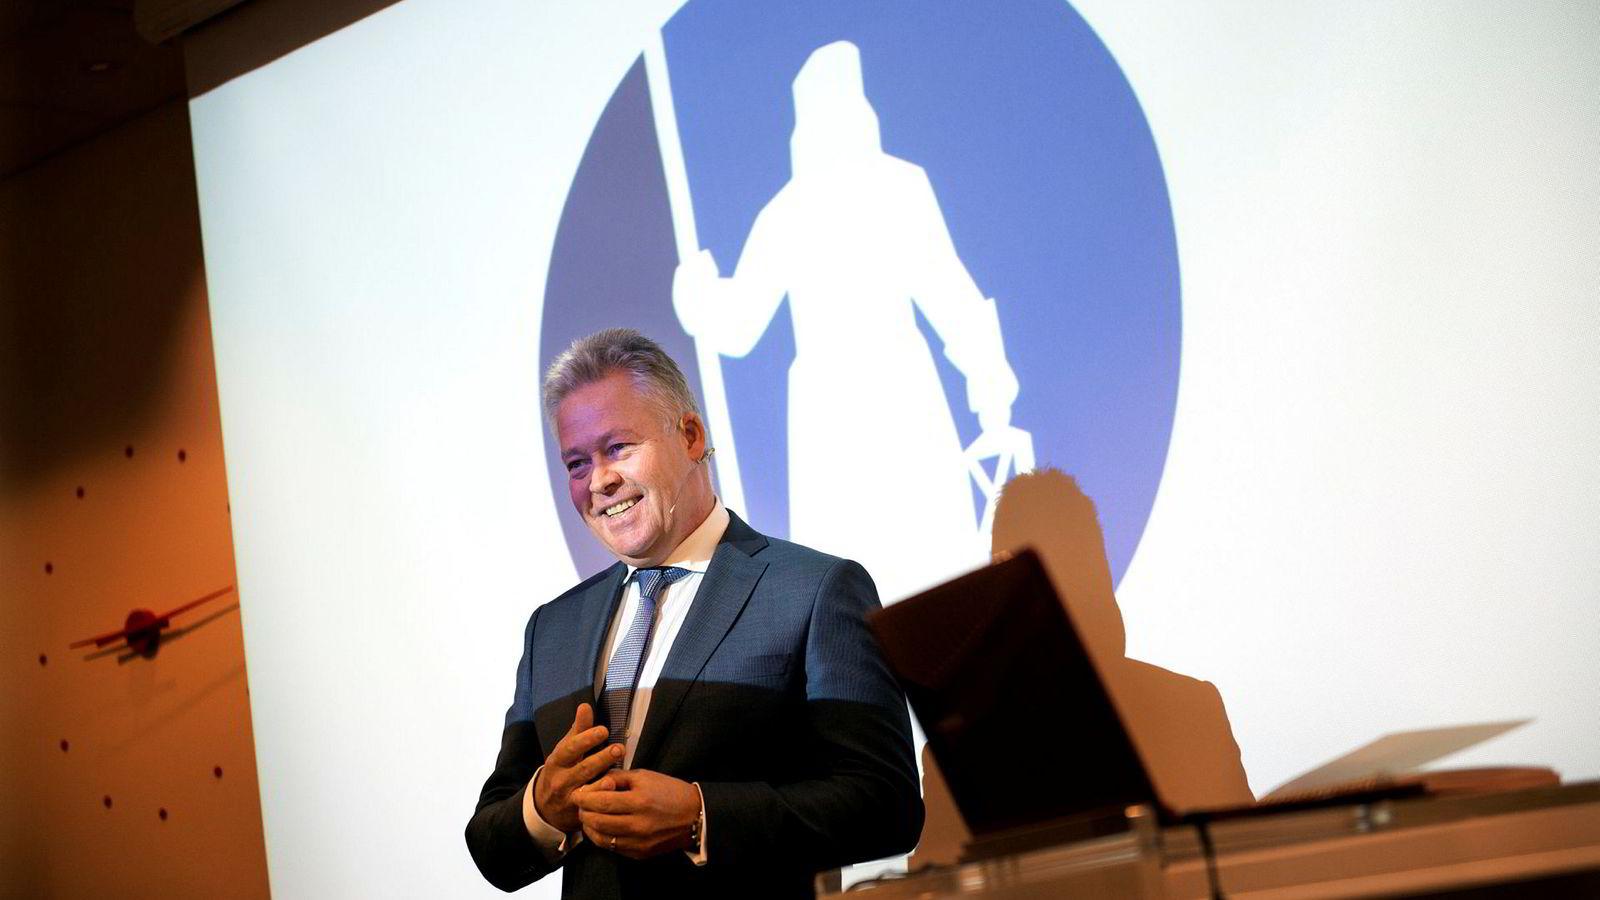 Gjensidige-sjef Helge Leiro Baastad.